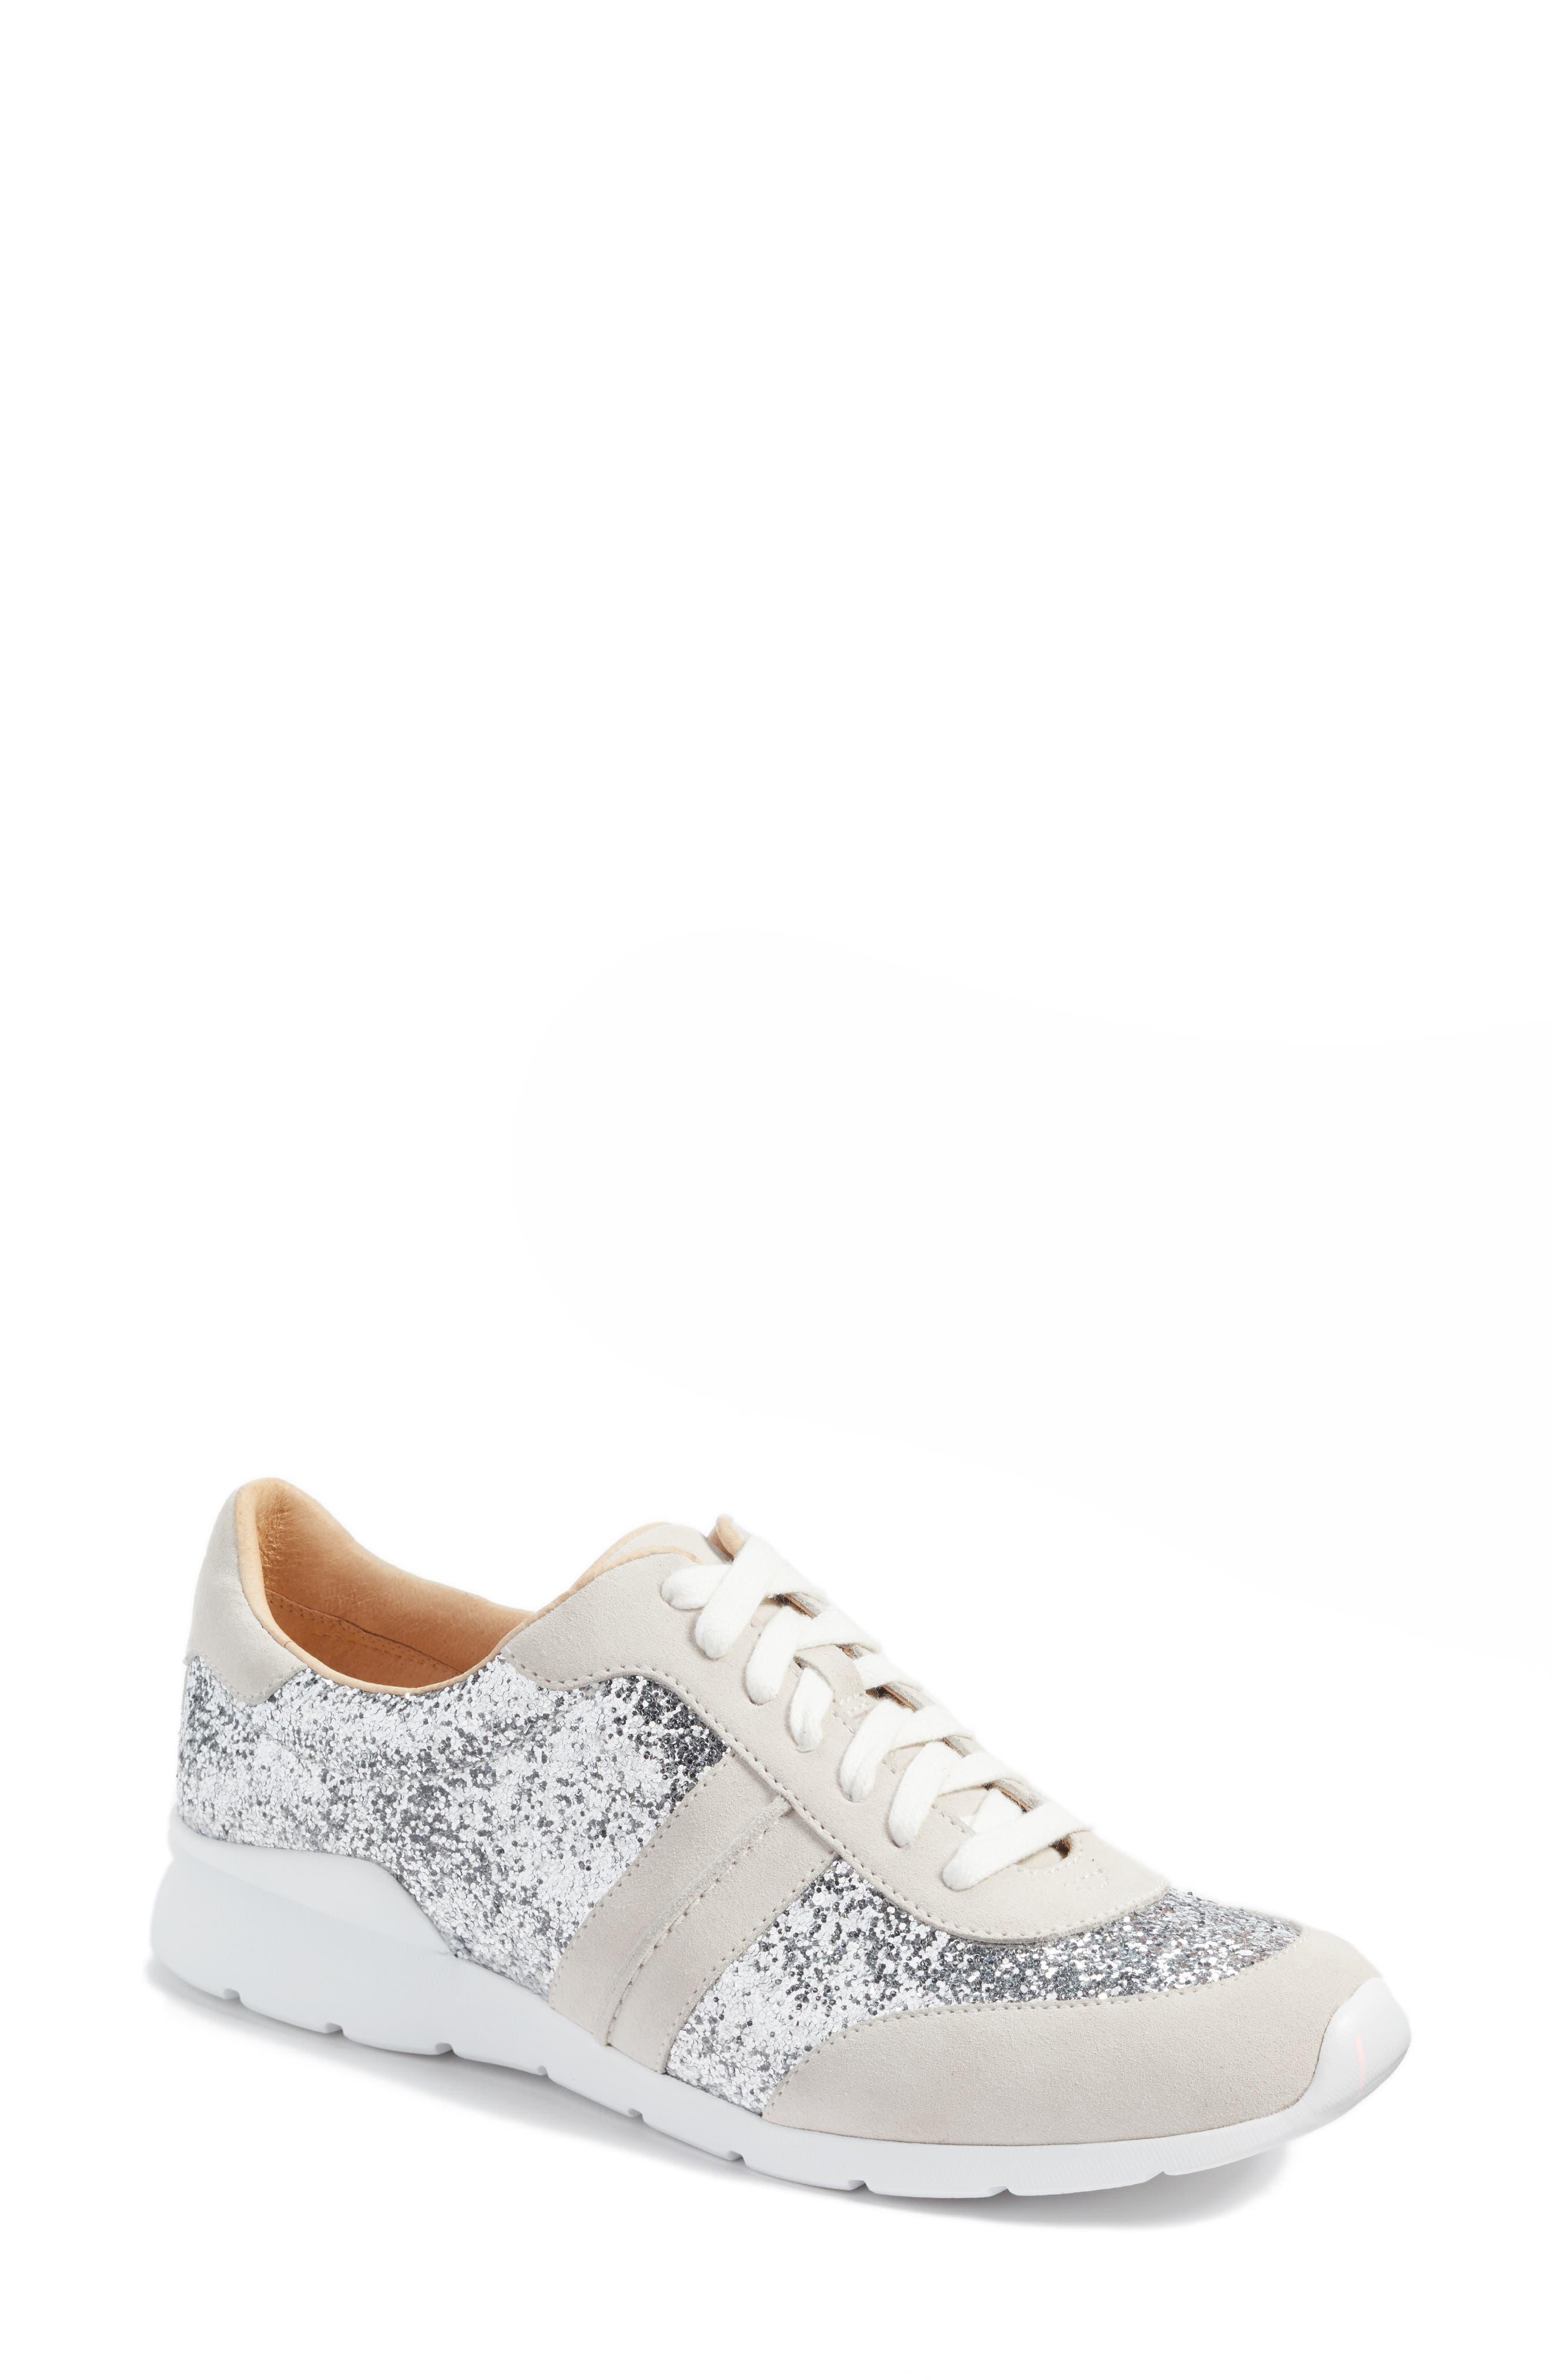 Jaida Glitter Sneaker,                         Main,                         color, 040